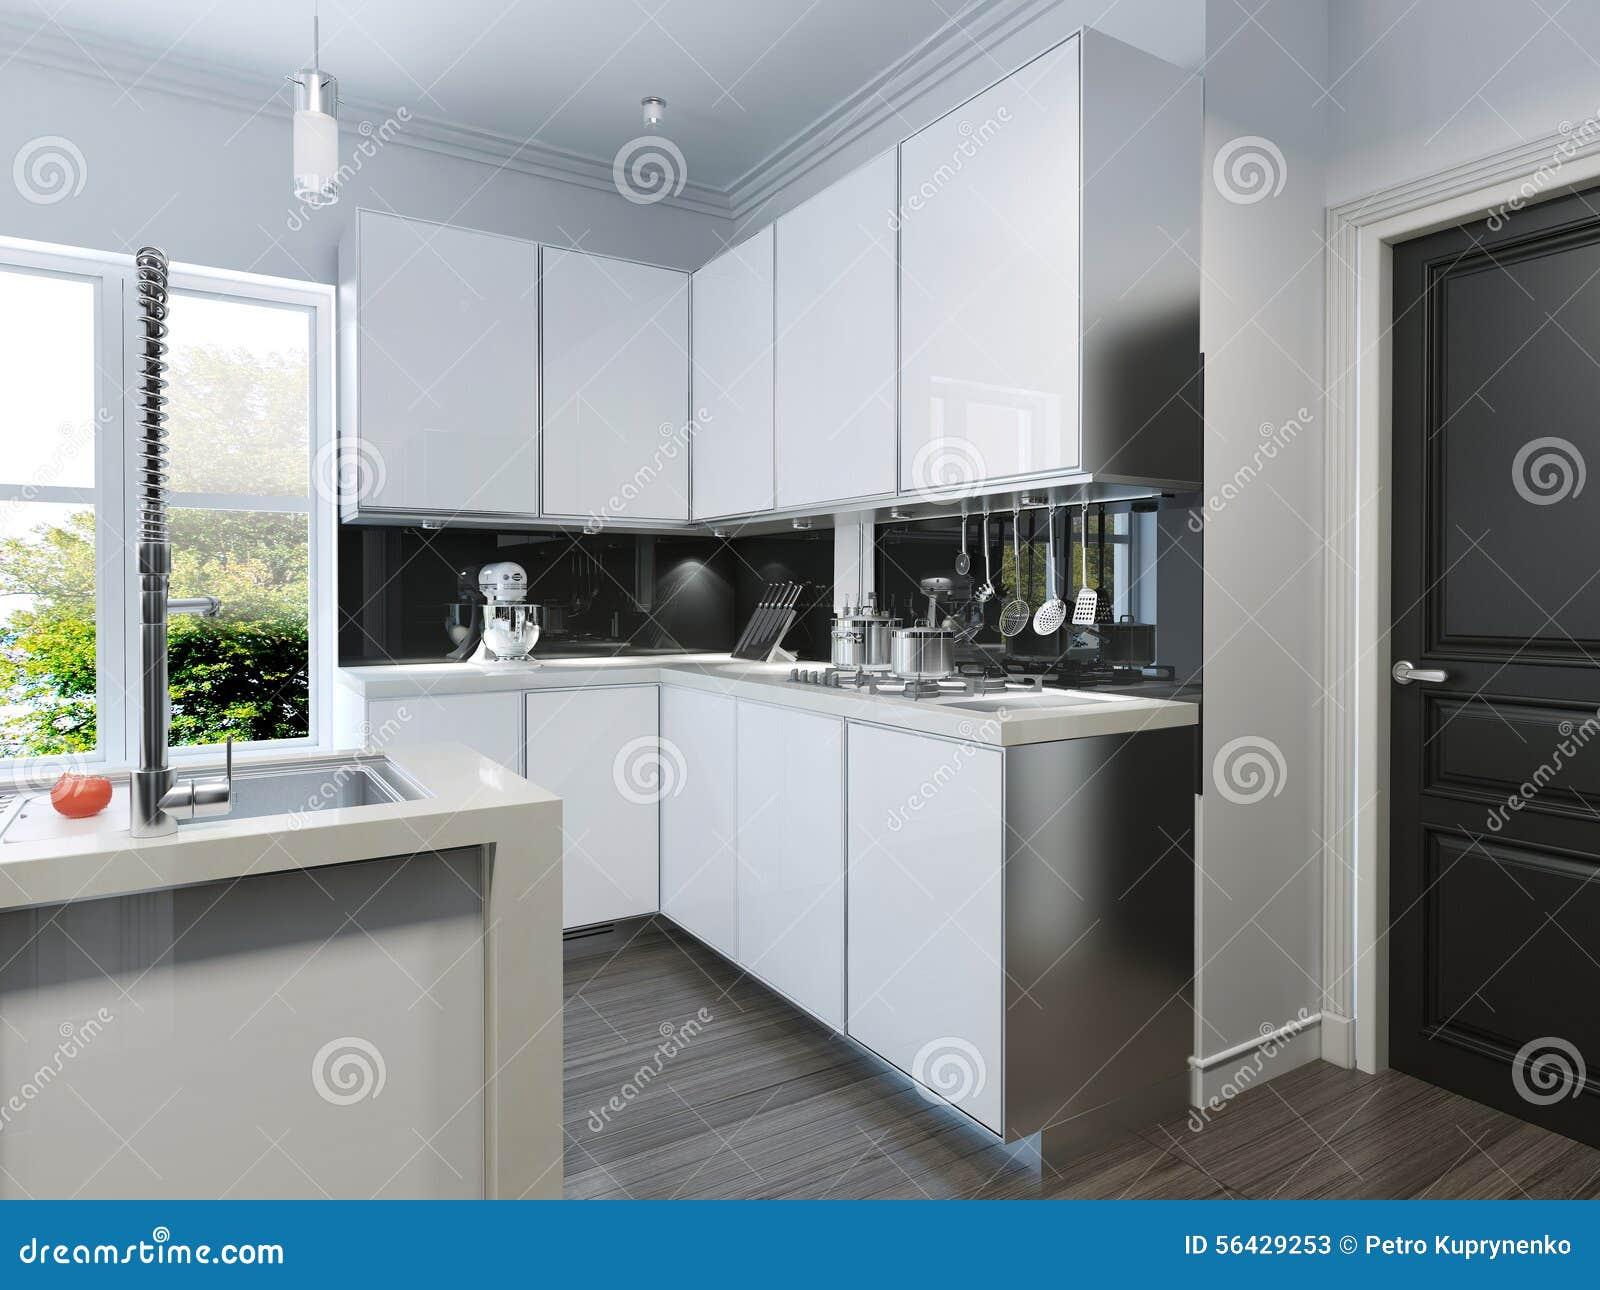 Lambris Salle De Bain Castorama : Cocinabarra Moderna Stock de ilustración  Imagen 56429253